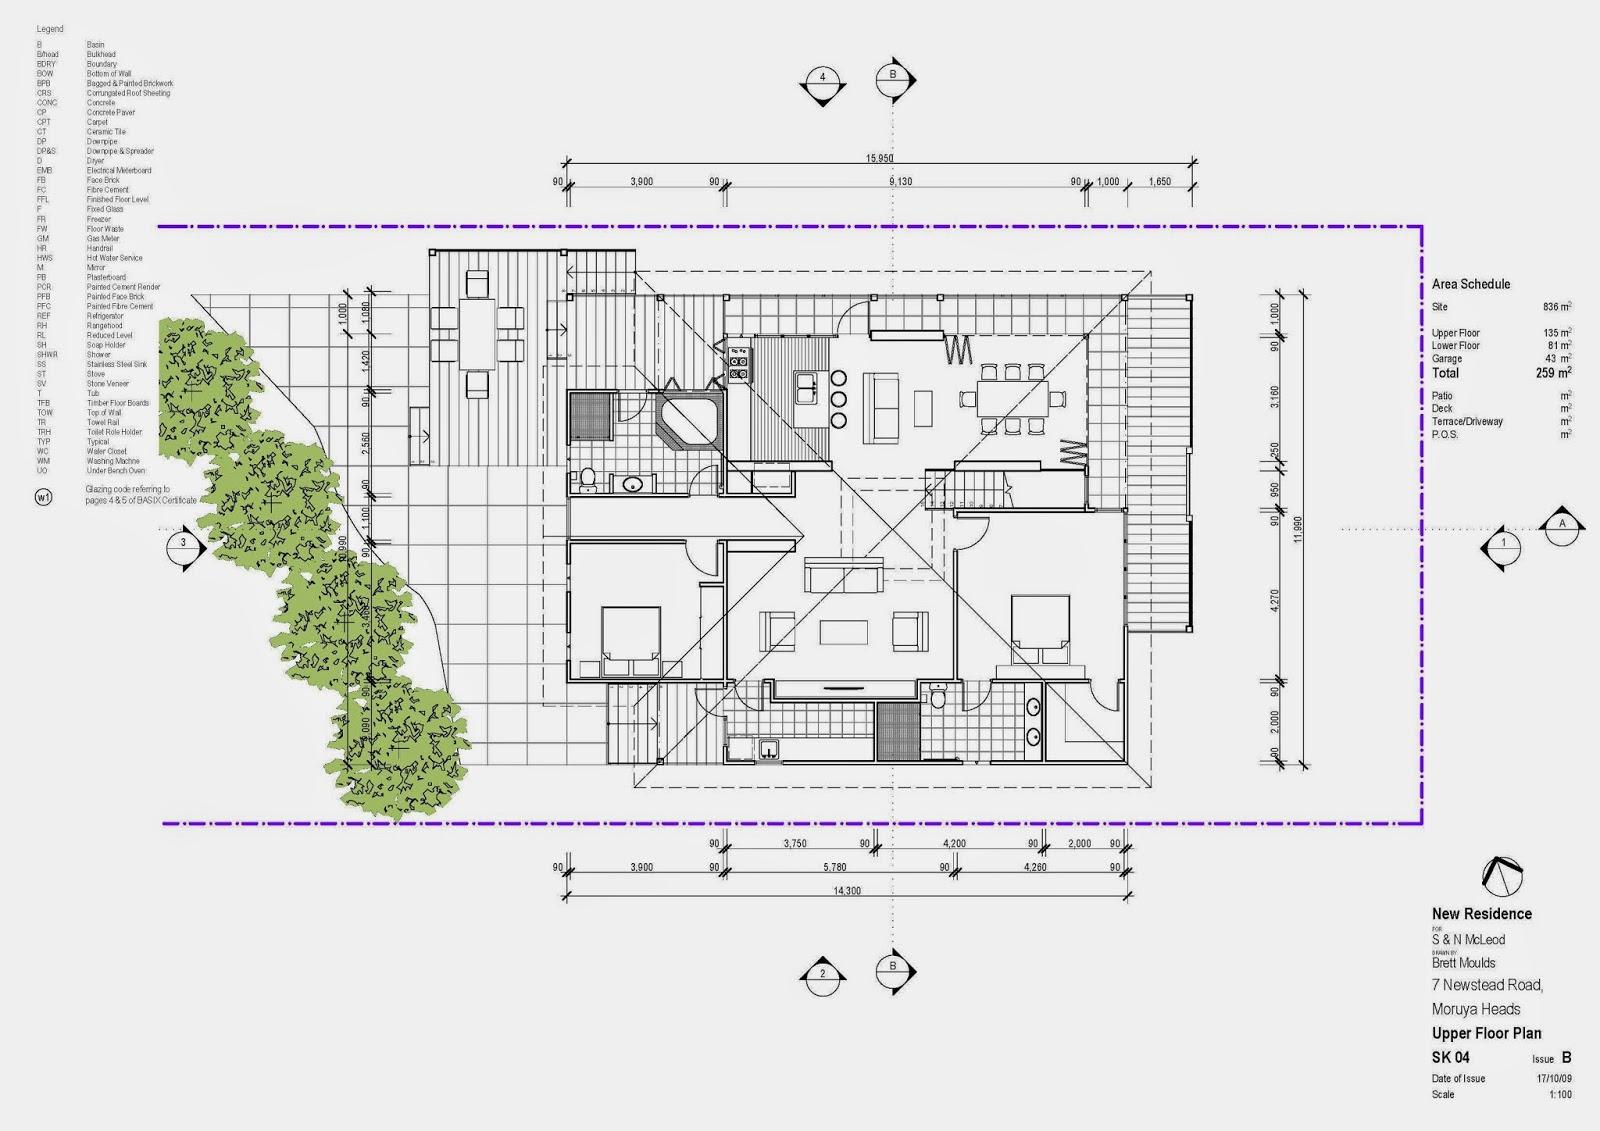 Architectural Floor Plan : Architectural Floor Plan